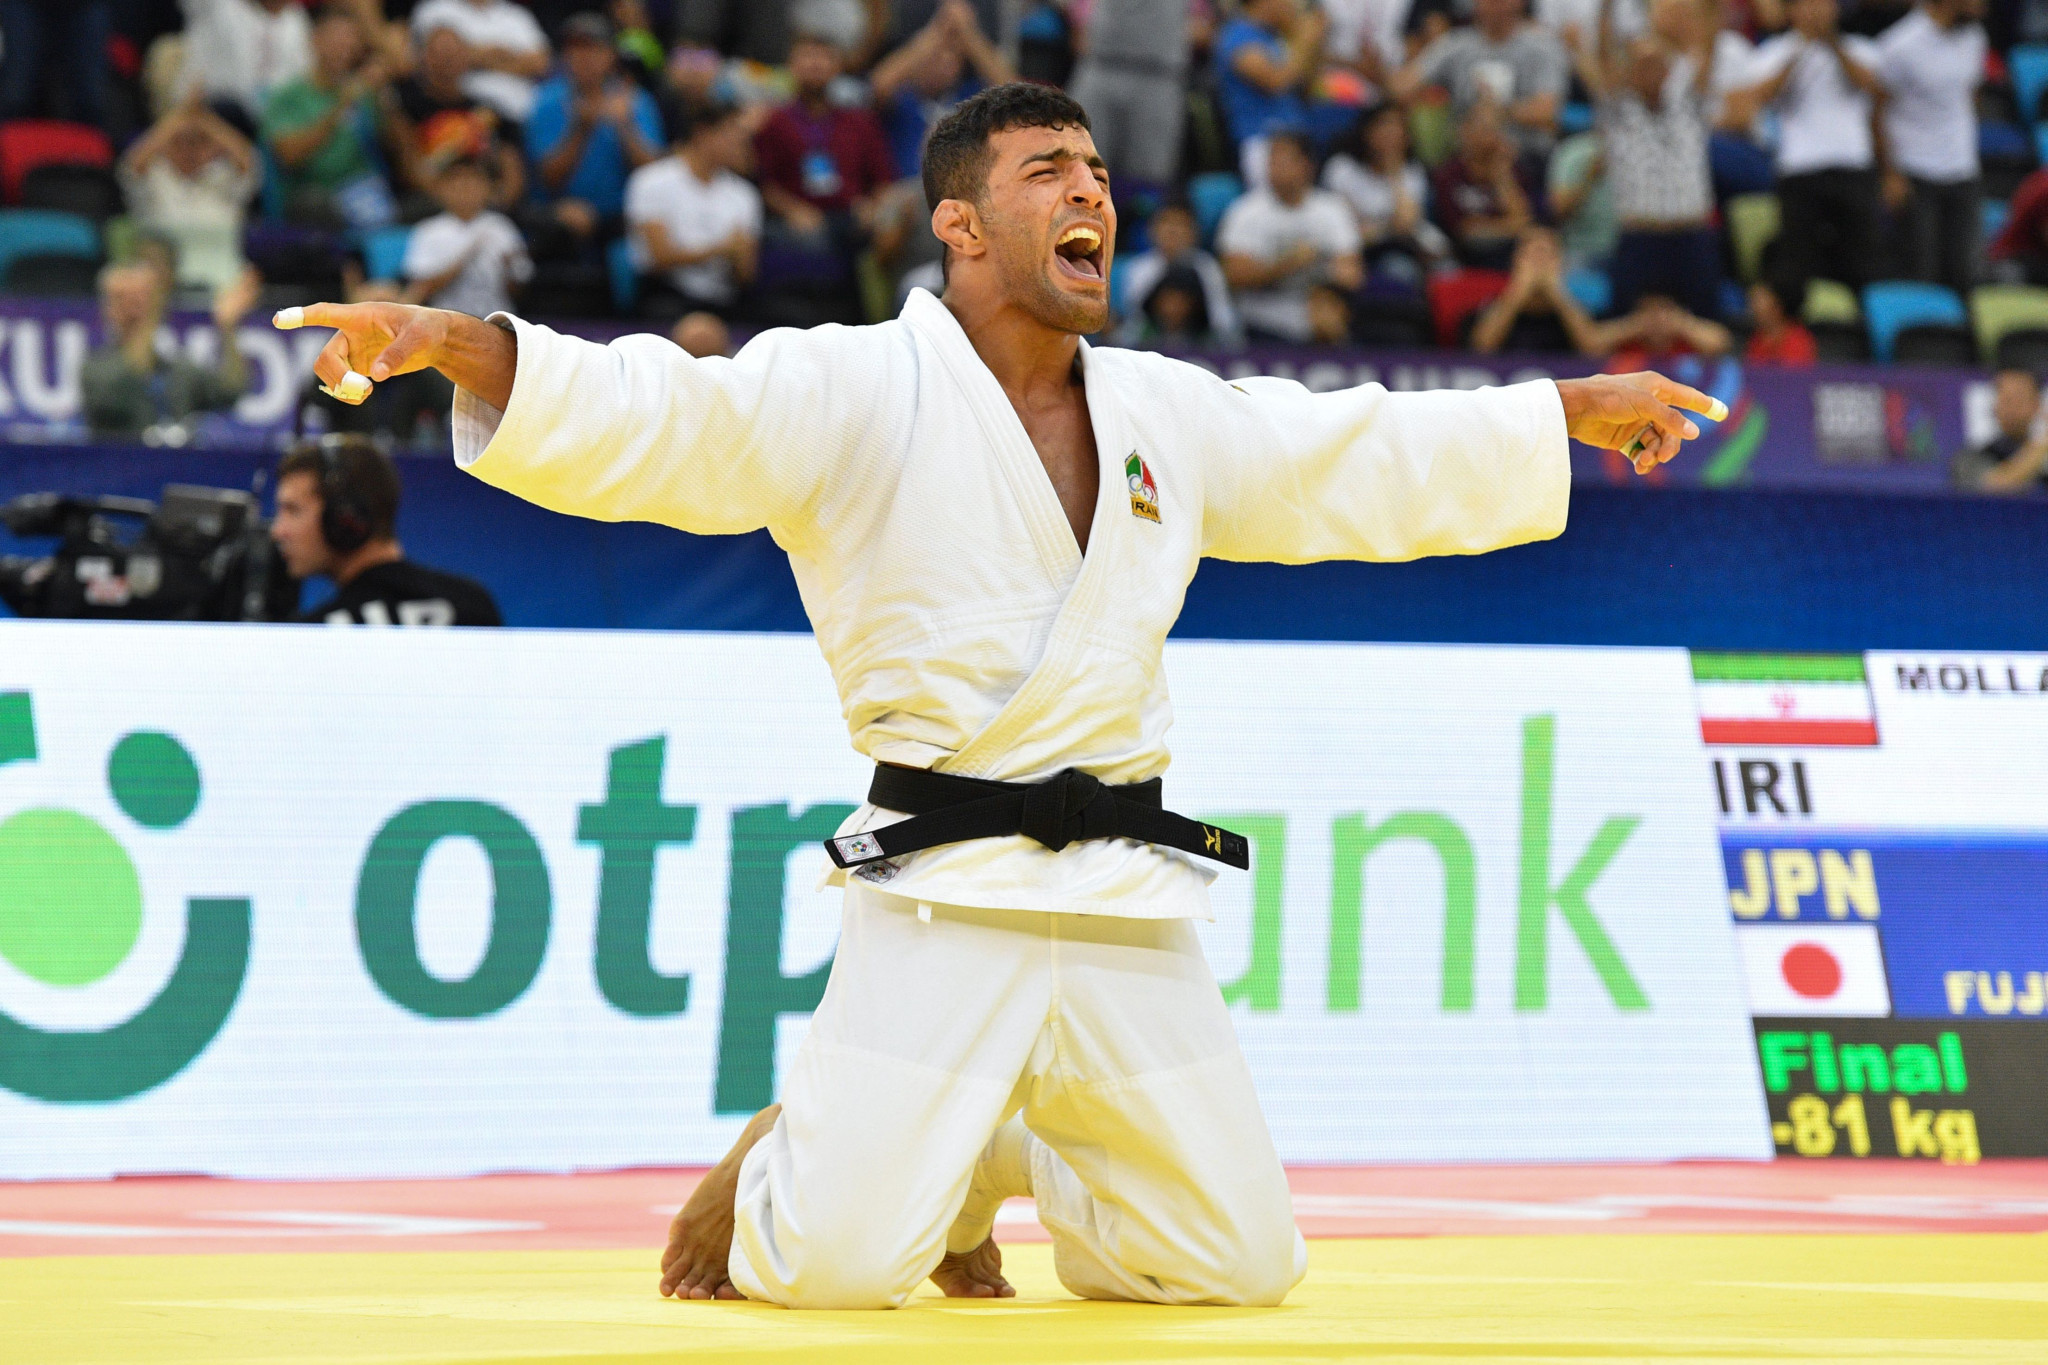 Iran given four-year ban by International Judo Federation in Mollaei case